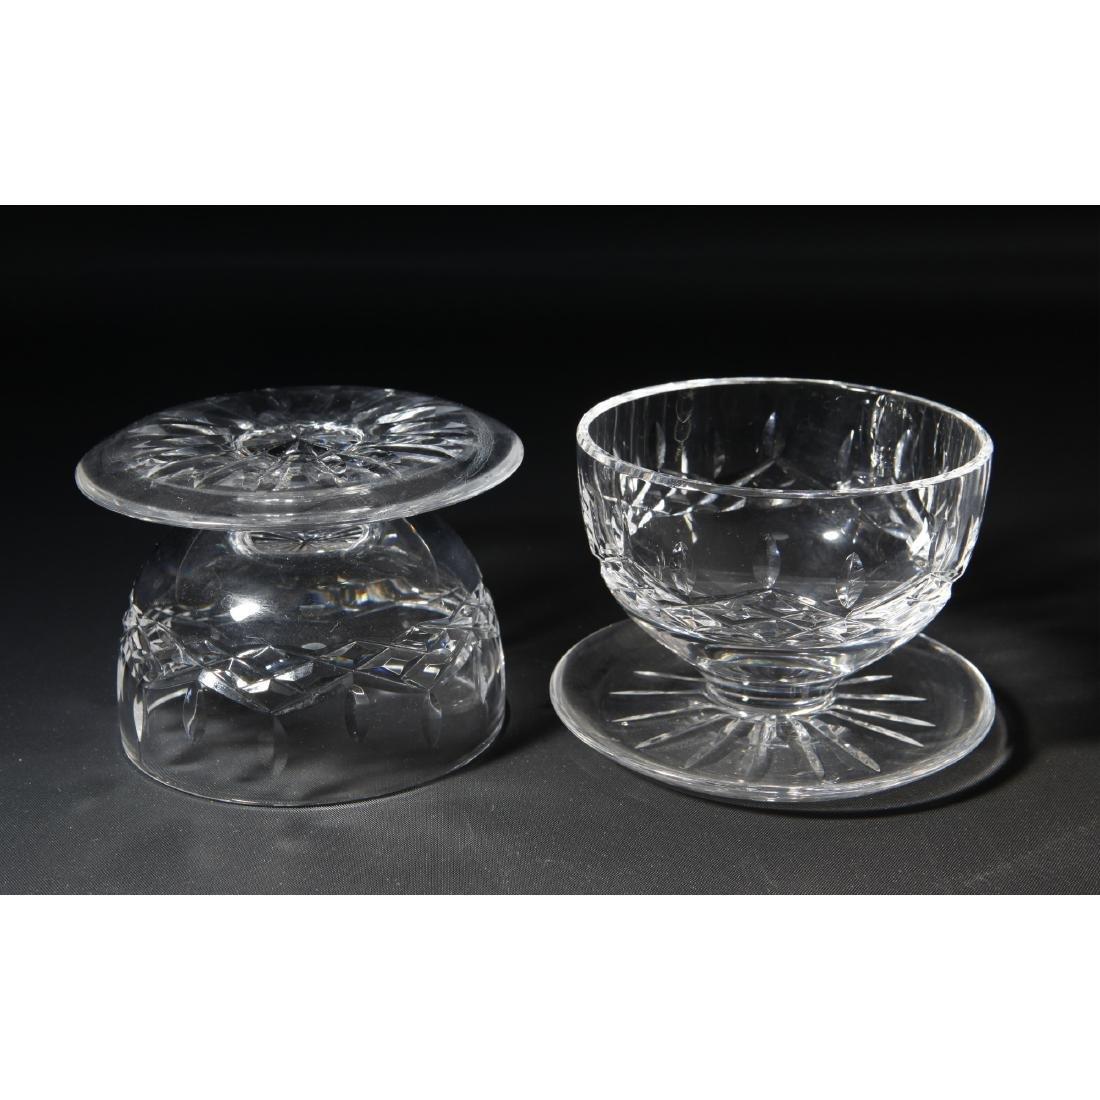 8PC WATERFORD LISMORE GLASSES, CLOCK, PEN HOLDER - 10